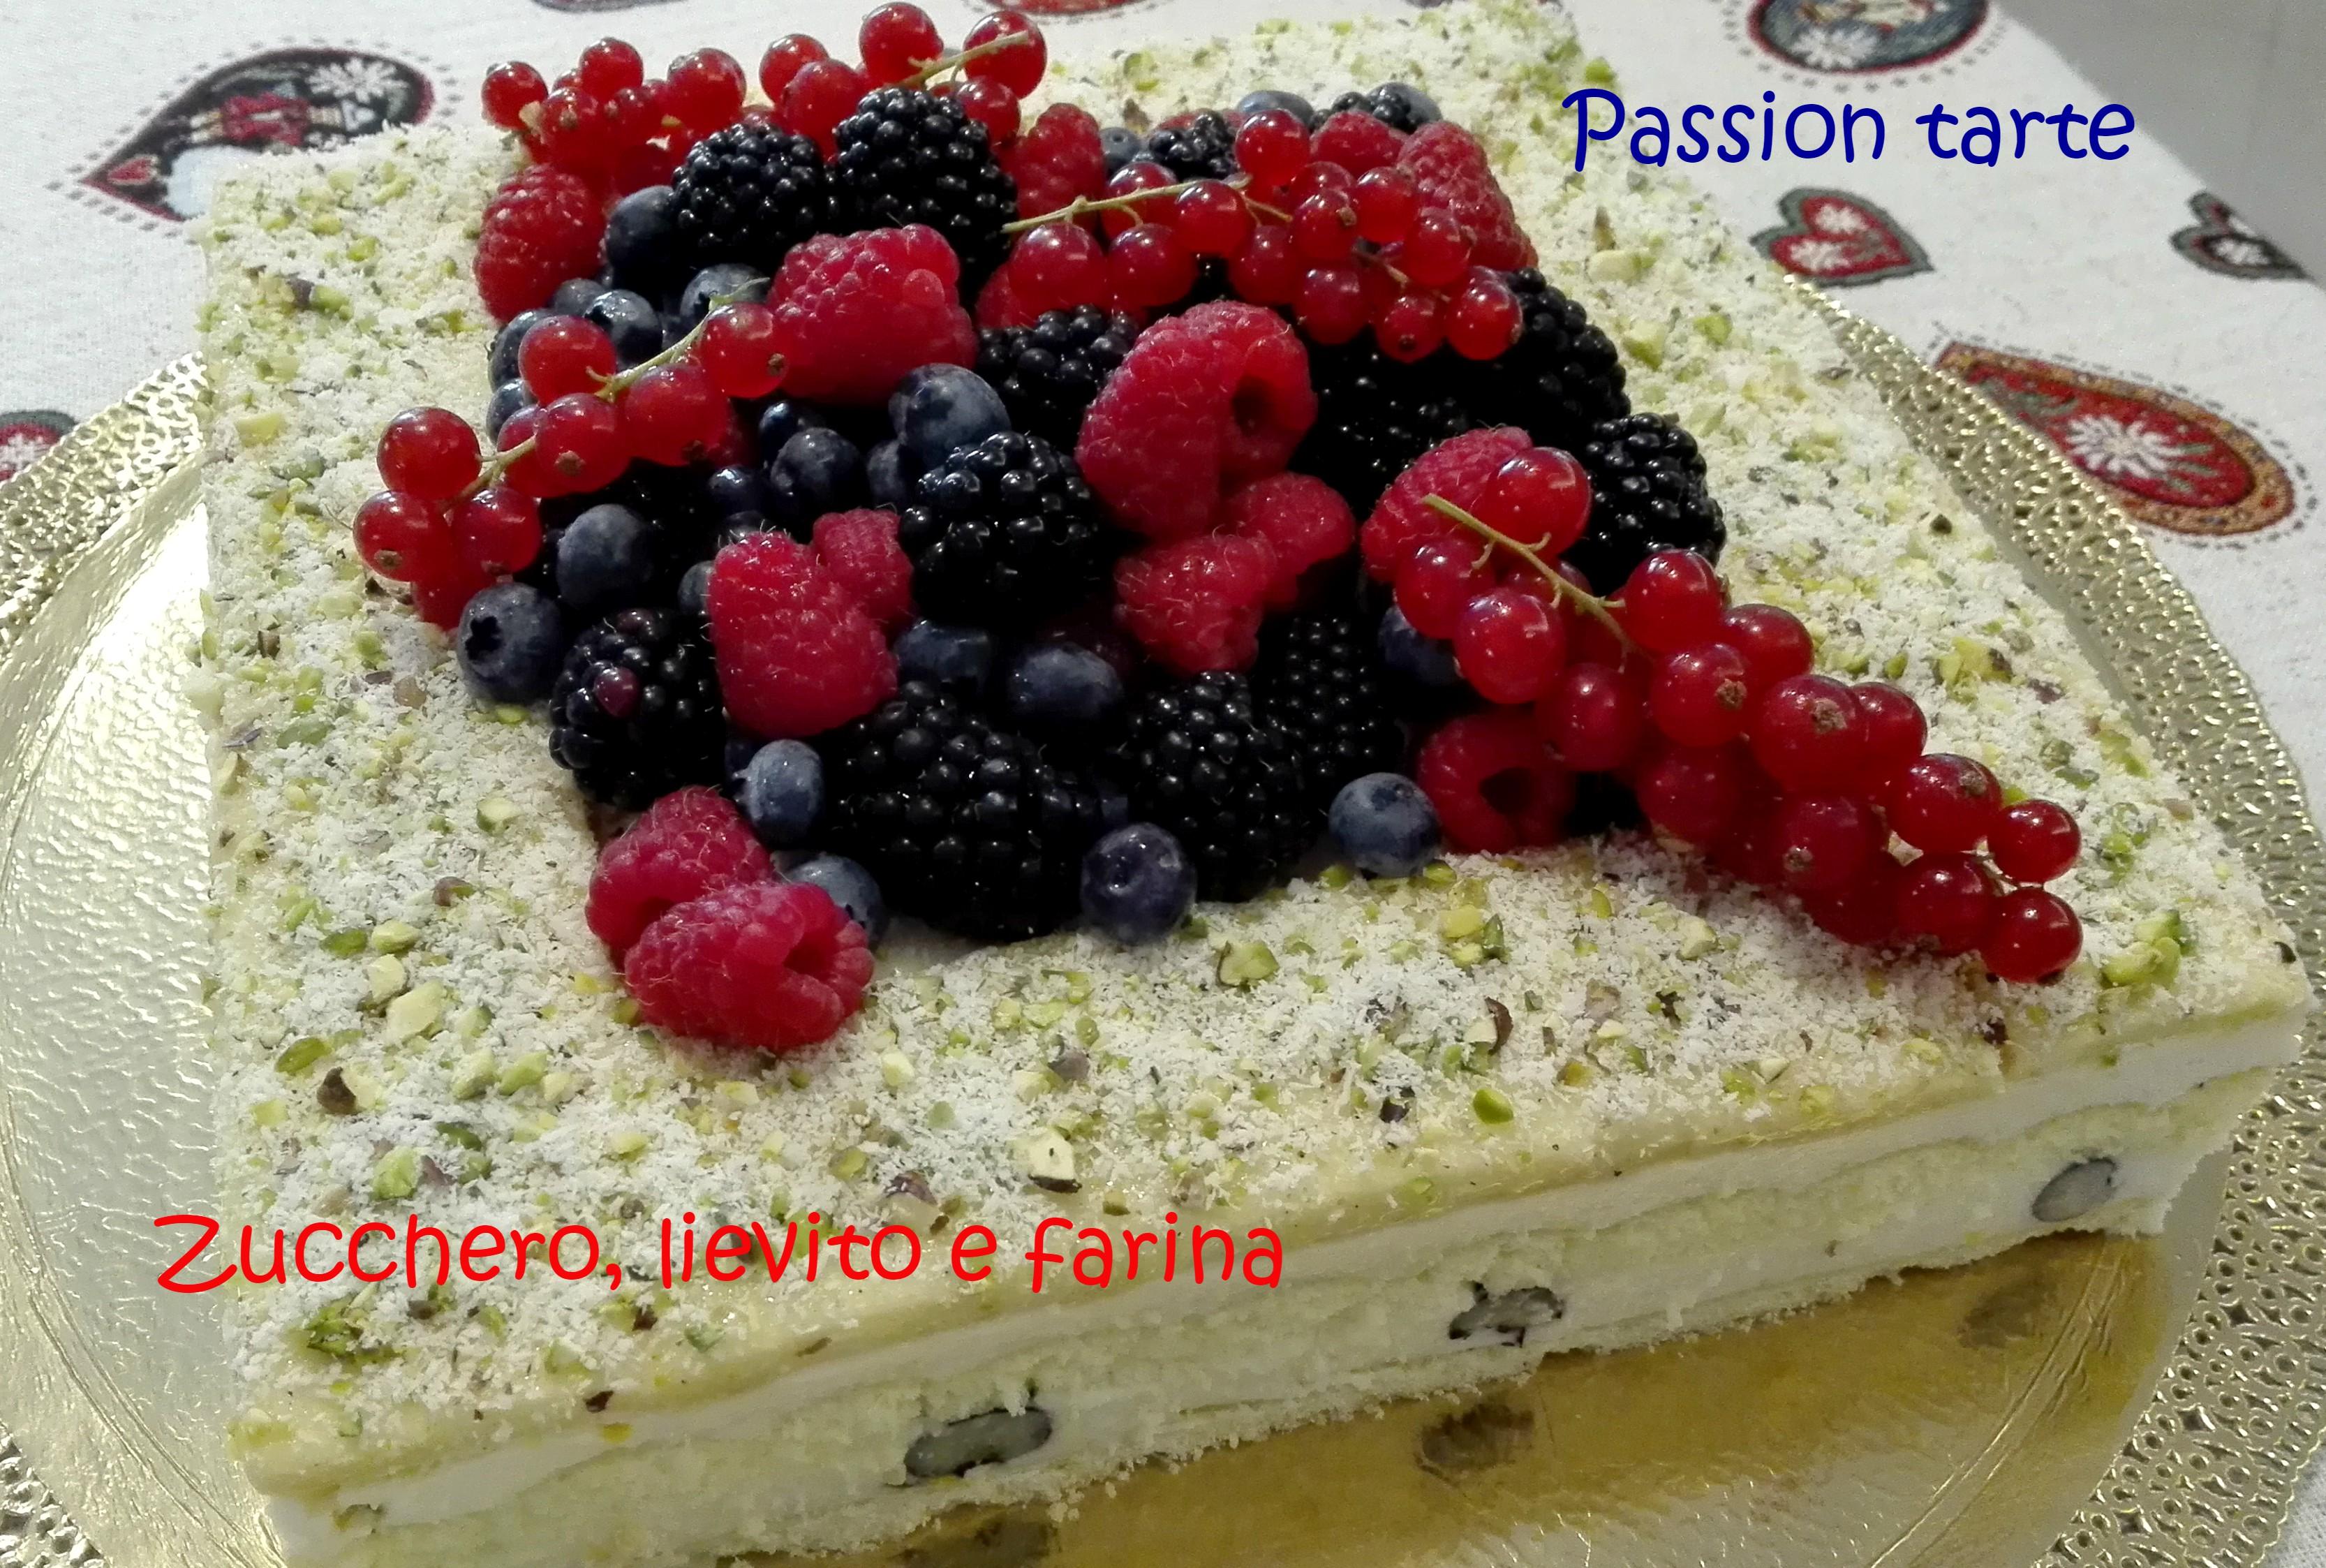 Passion tarte